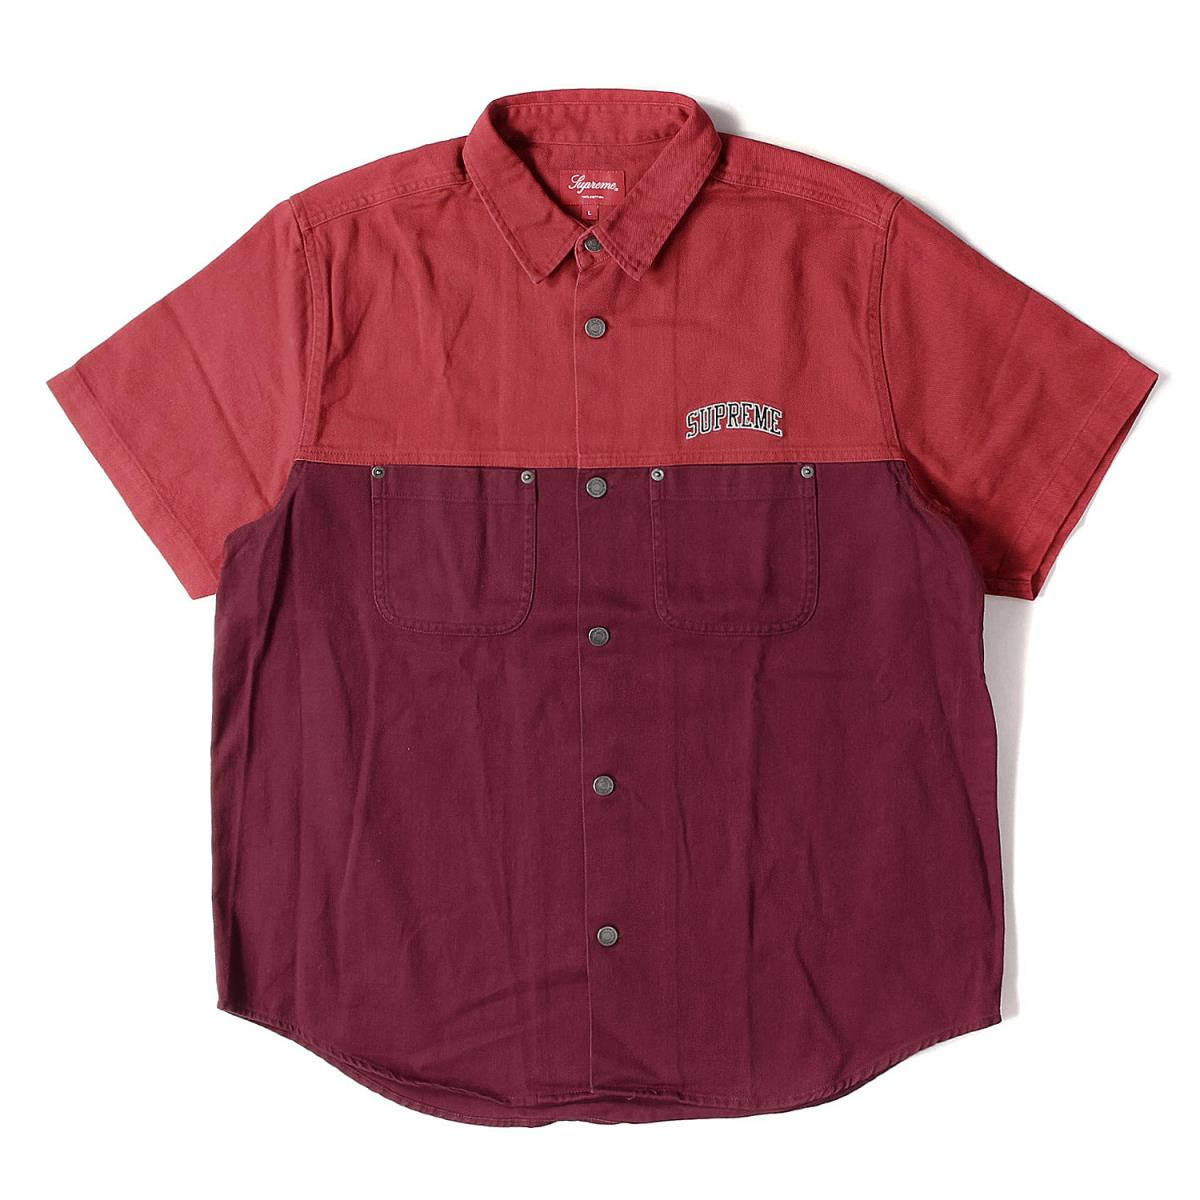 Supreme (シュプリーム) 19SS アーチロゴ2トーンデニム半袖シャツ(2-Tone Denim S/S Shirt) レッド L 【メンズ】【中古】【新品同様】【K2566】【あす楽☆対応可】